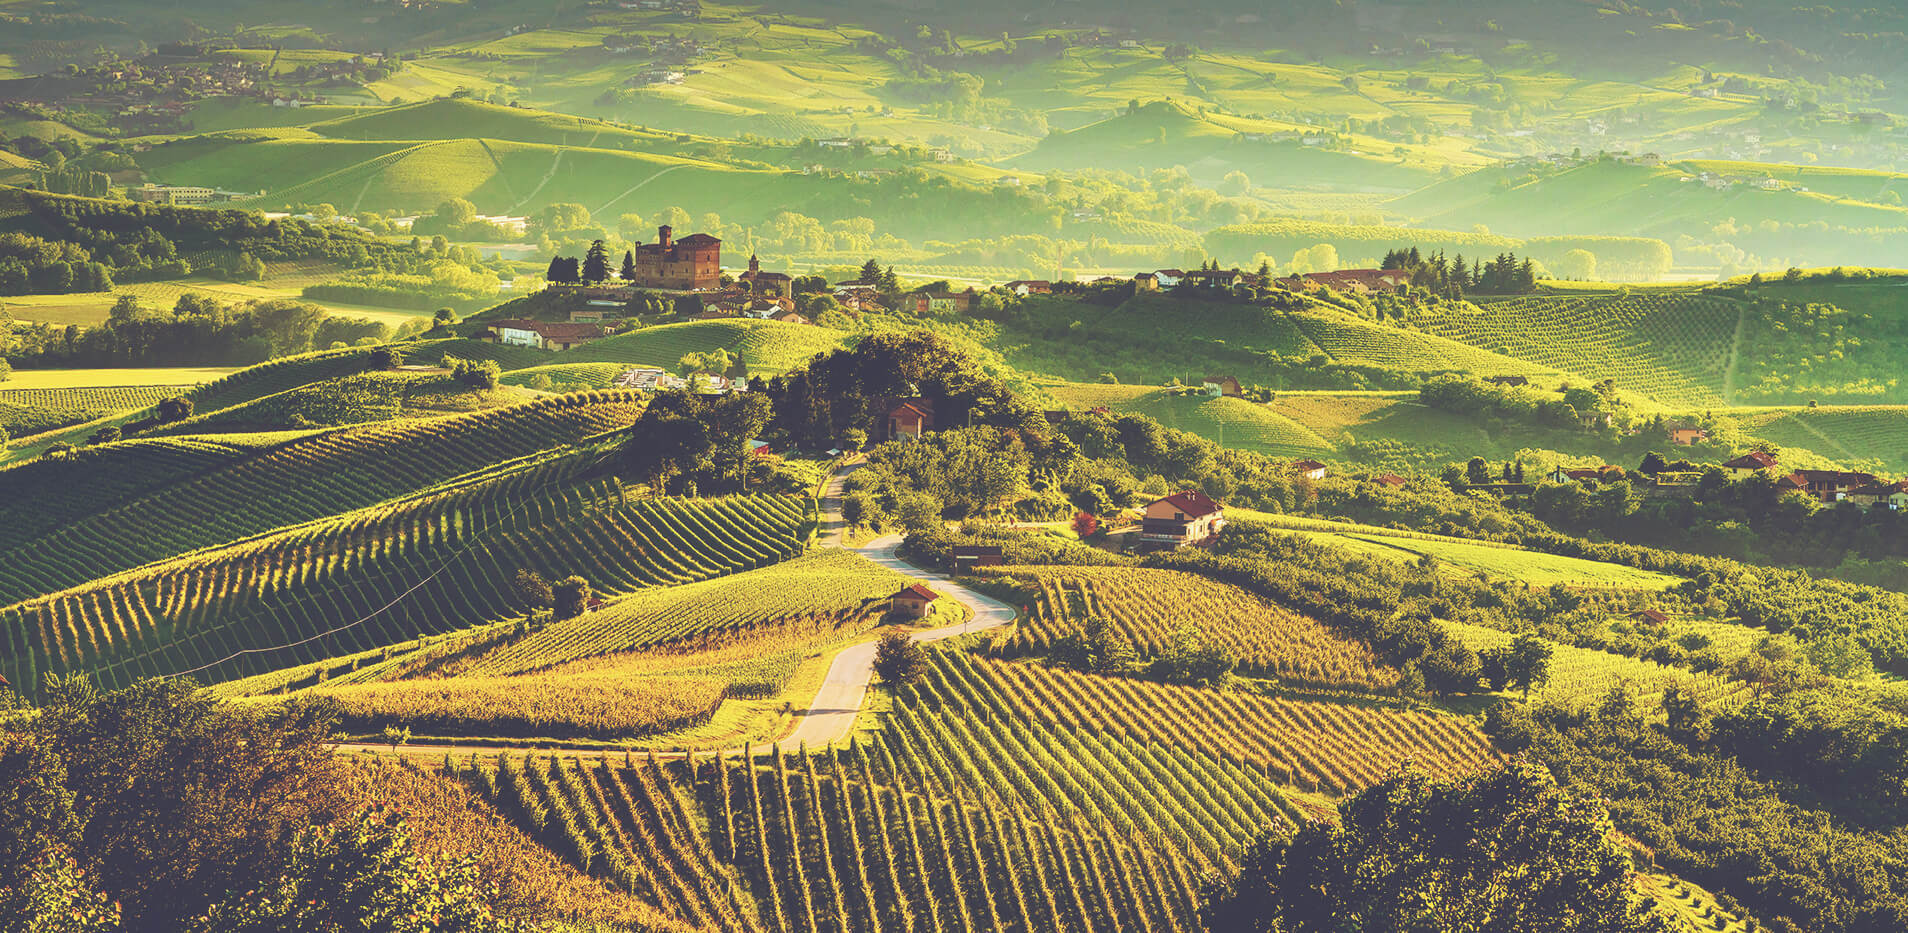 Matt Desert Island Wines - Piedmont